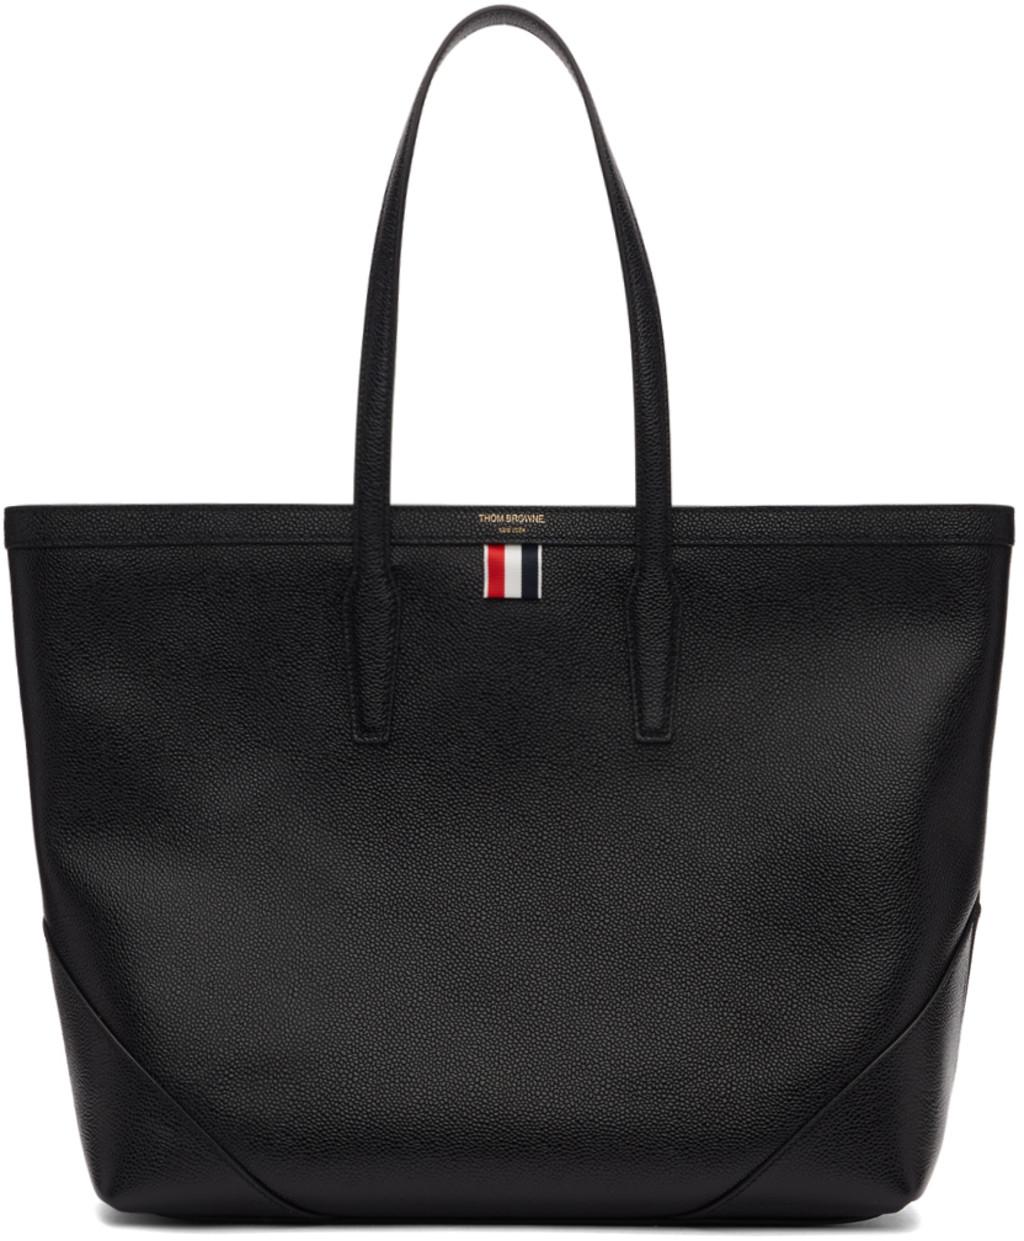 Designer tote bags for Women   SSENSE 525d07a649